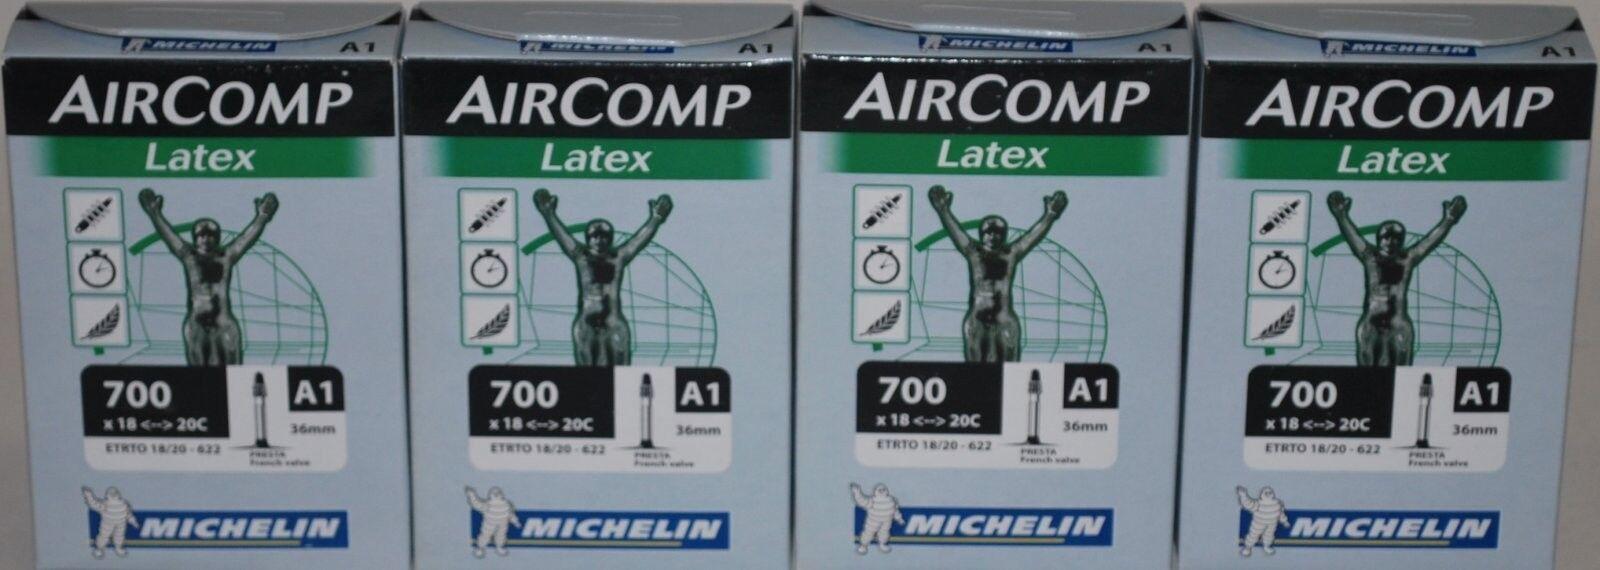 Michelin latex tubes 700 x 18-20 36mm stem 4 tubes per order